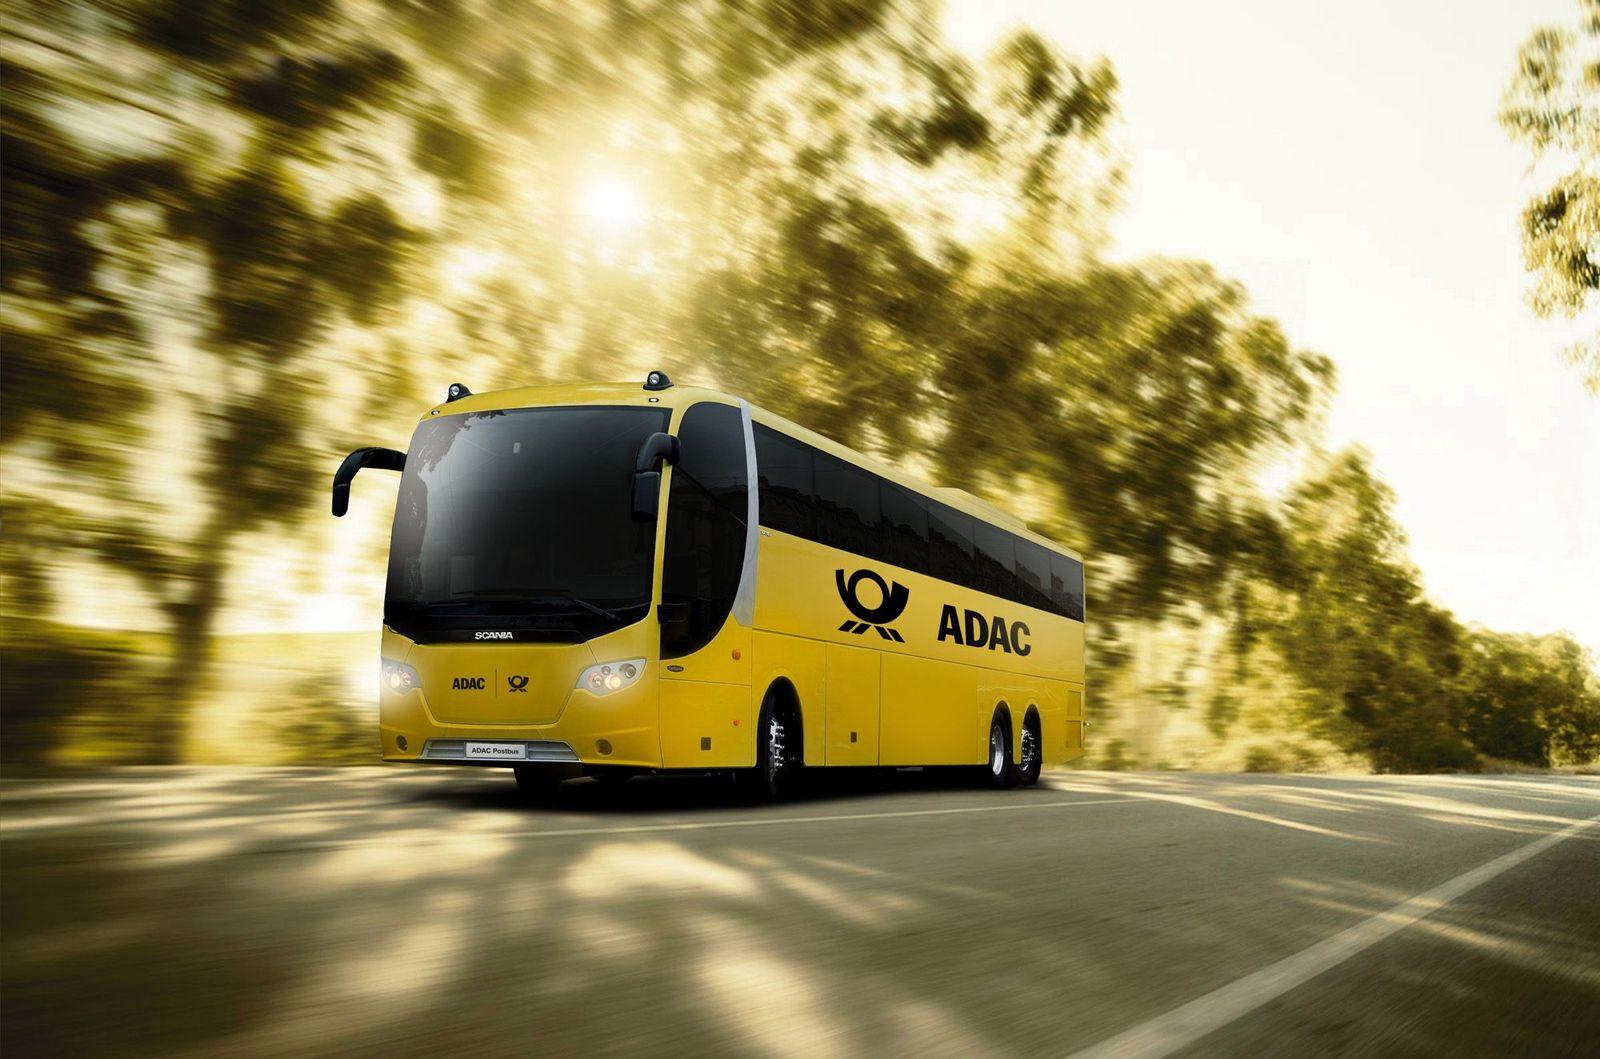 ADAC / Post / Fernbus